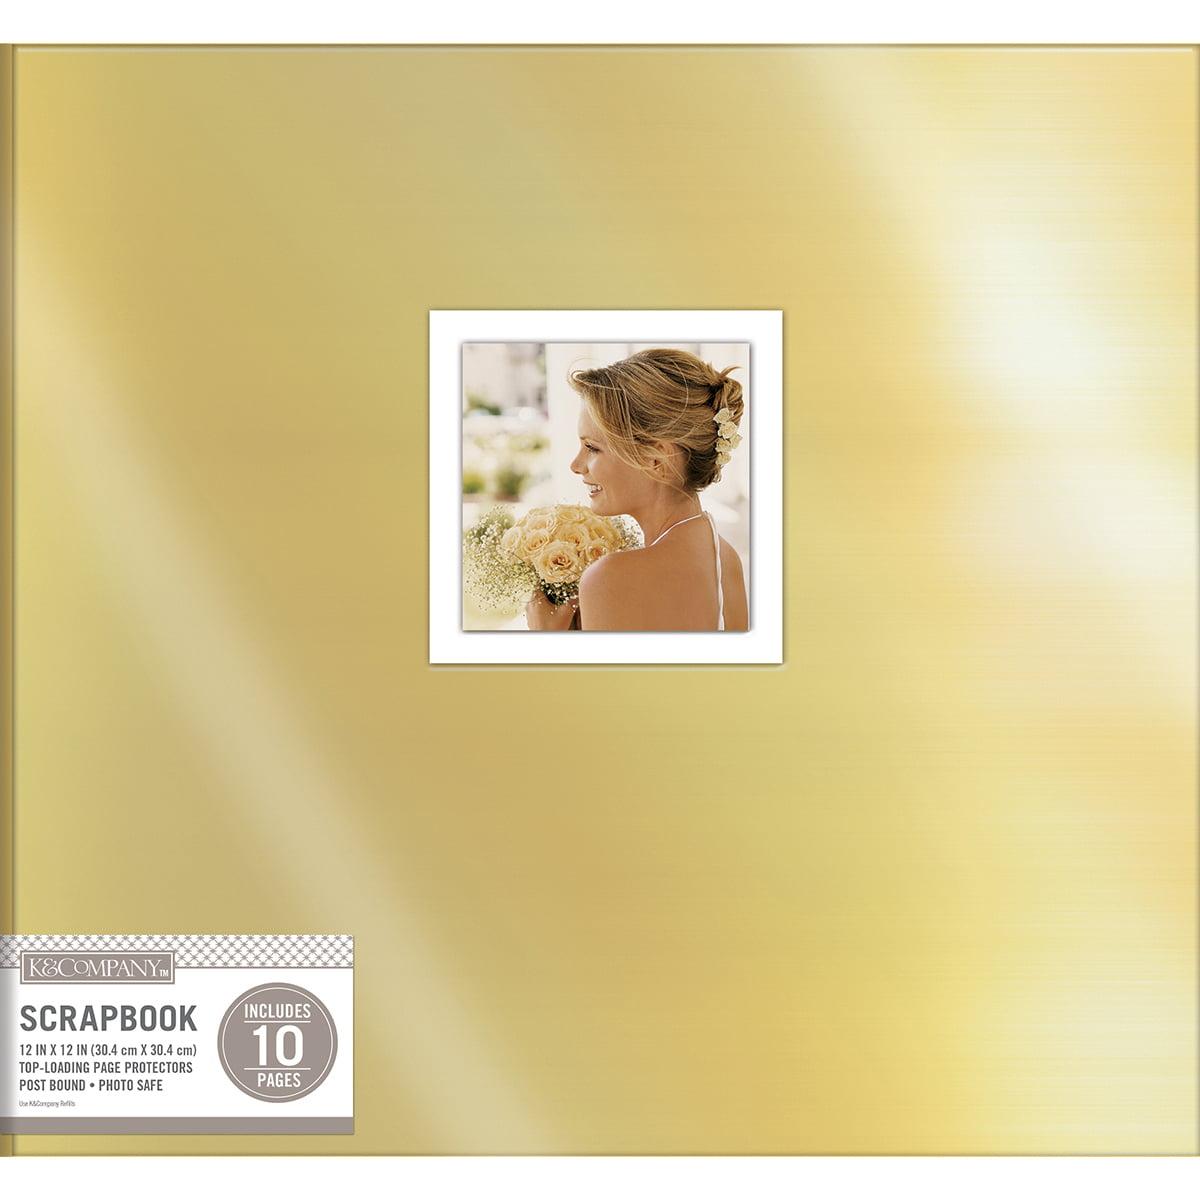 "K&Company Patterned Post Bound Window Album, 12"" x 12"""